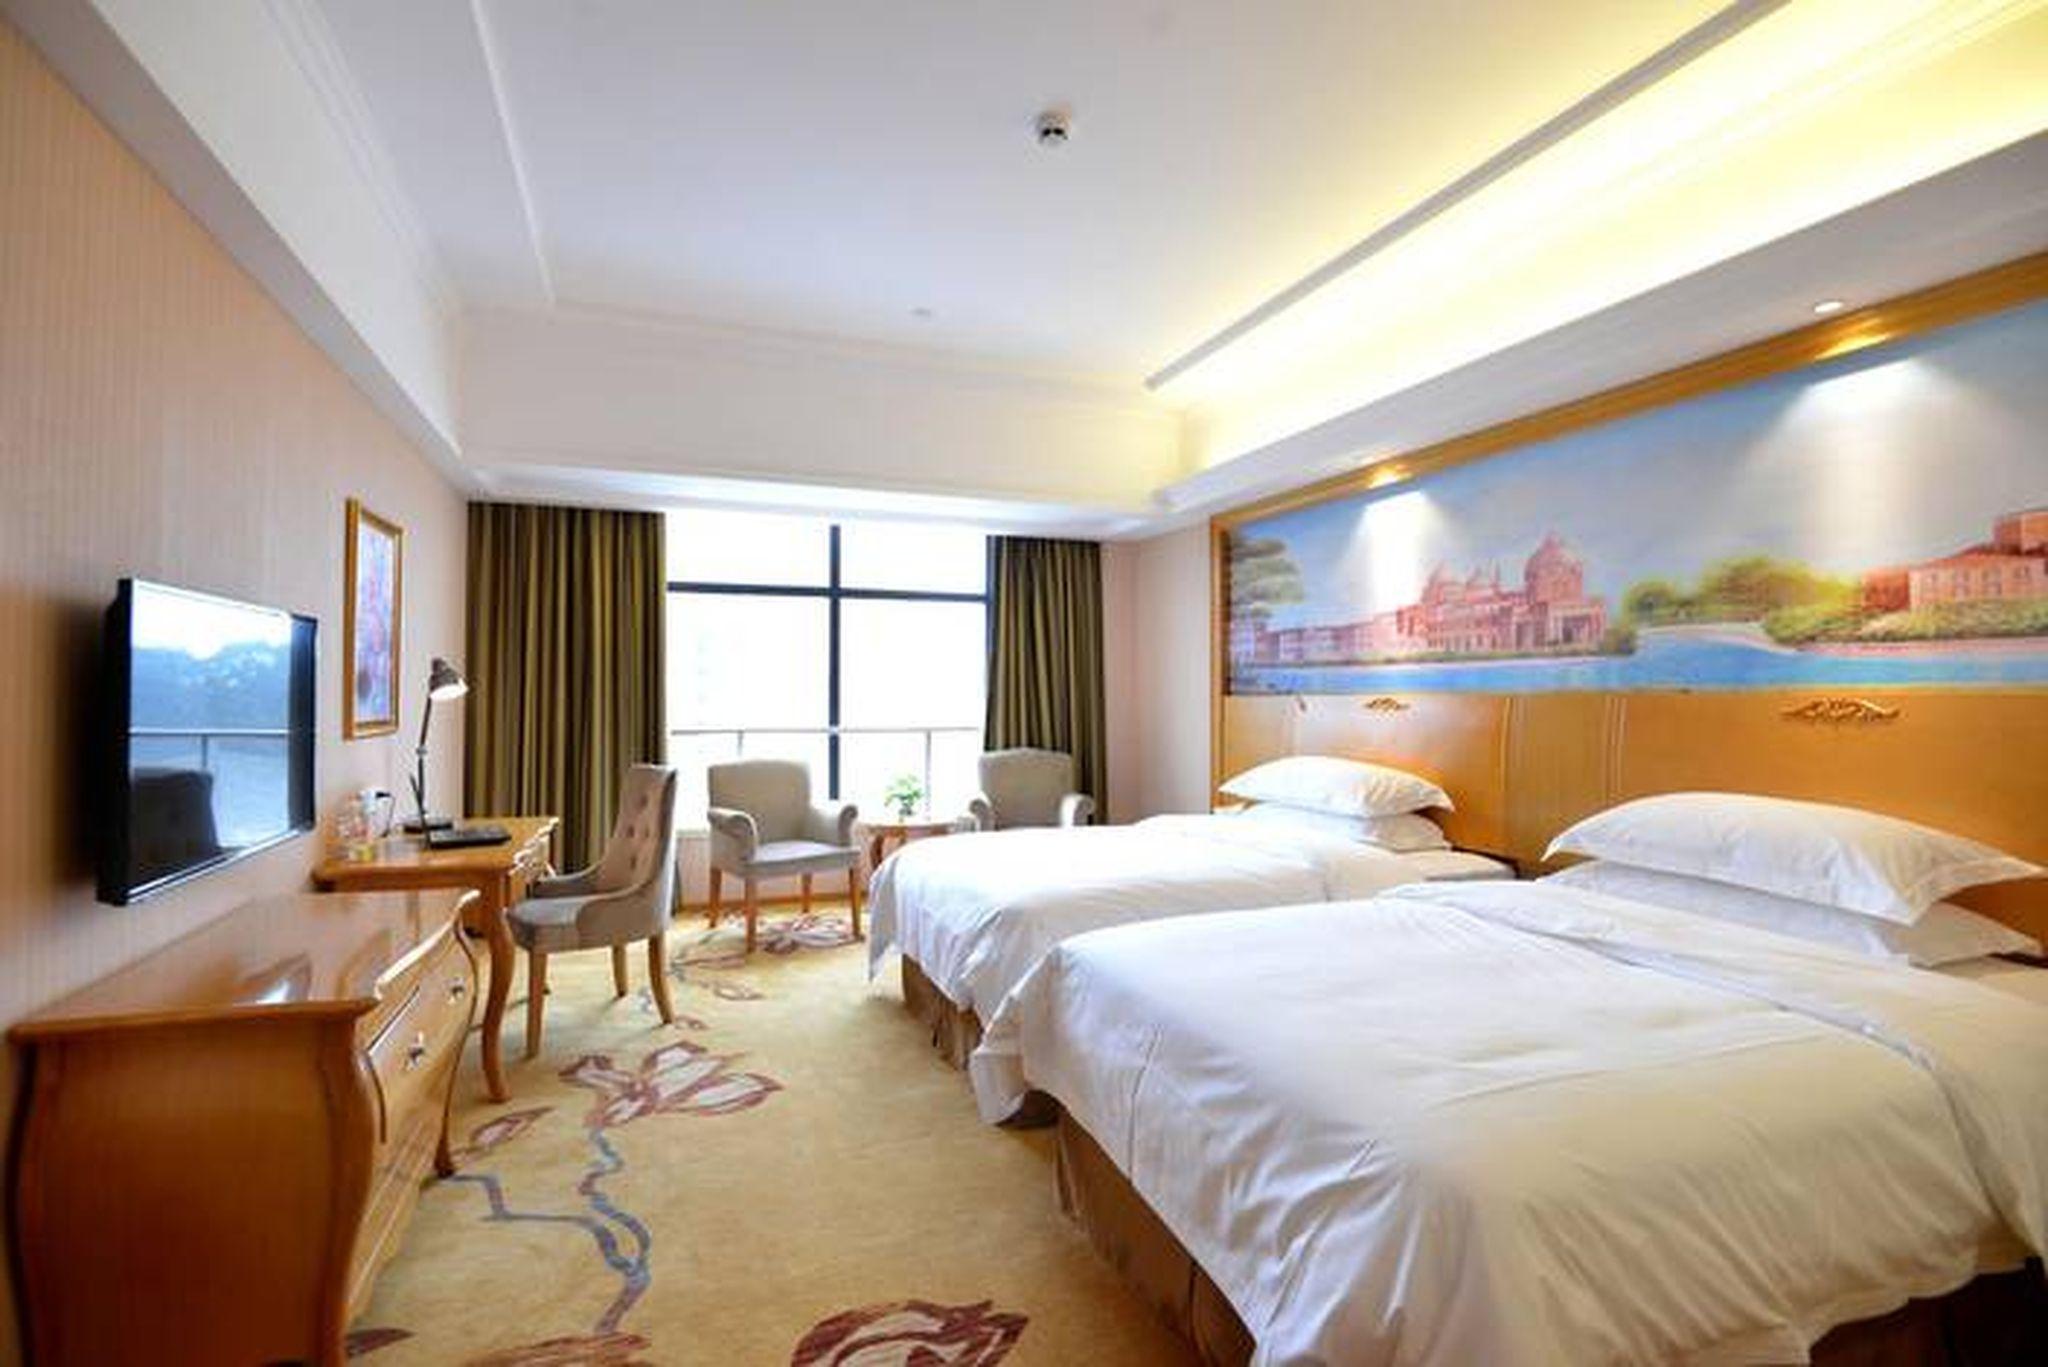 vienna hotel qinzhou north square branch china 2018 reviews rh agoda com